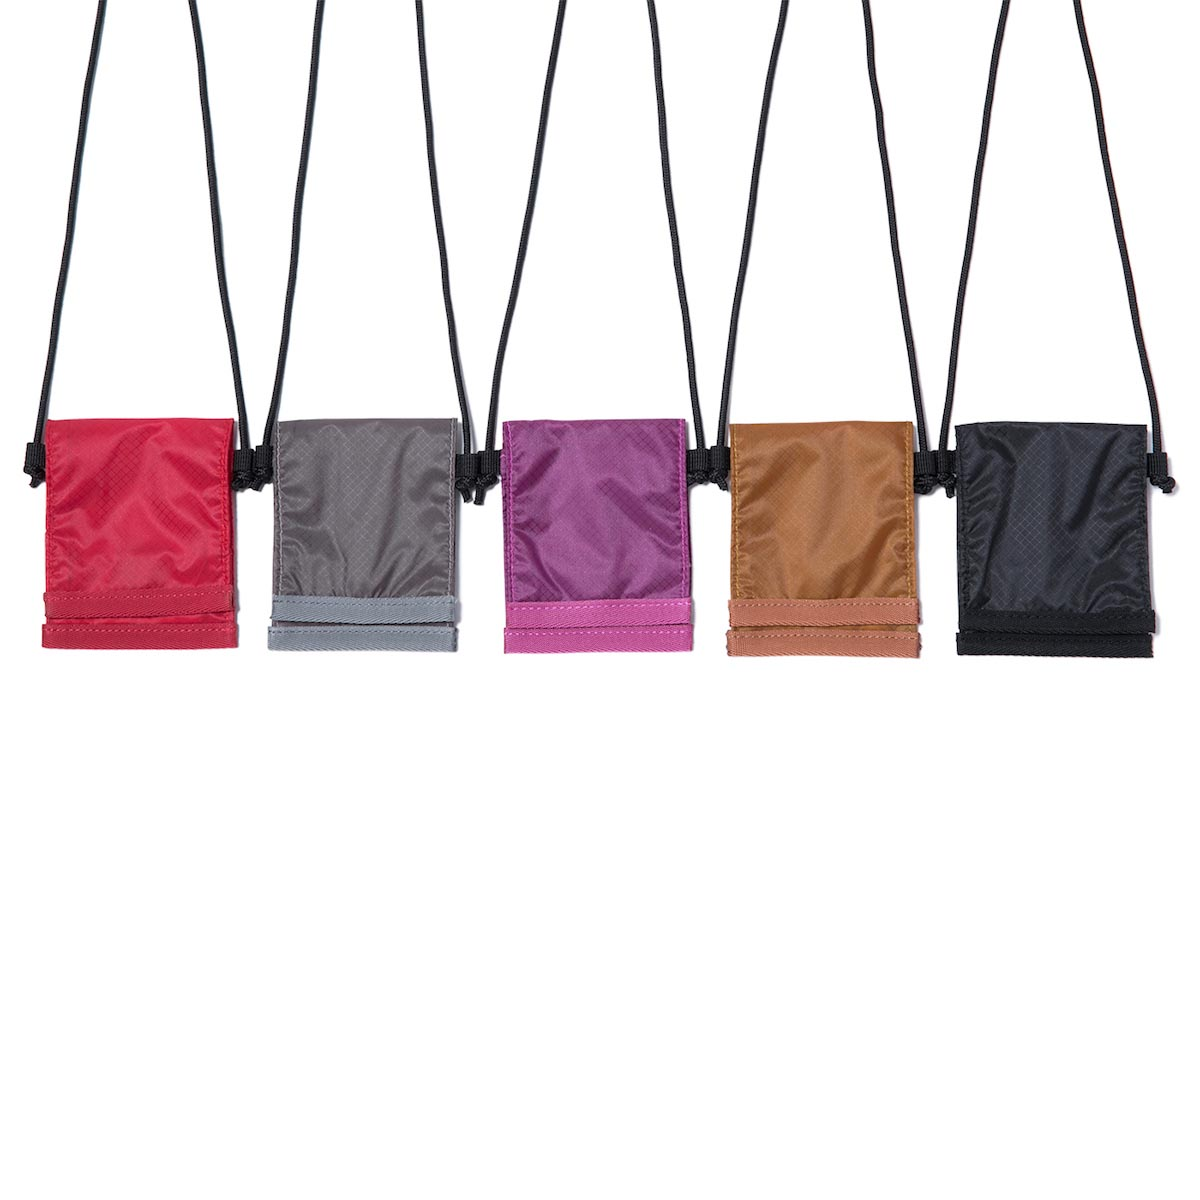 HOBO / CORDURA® Lightweight Nylon Ripstop Neck Pouch